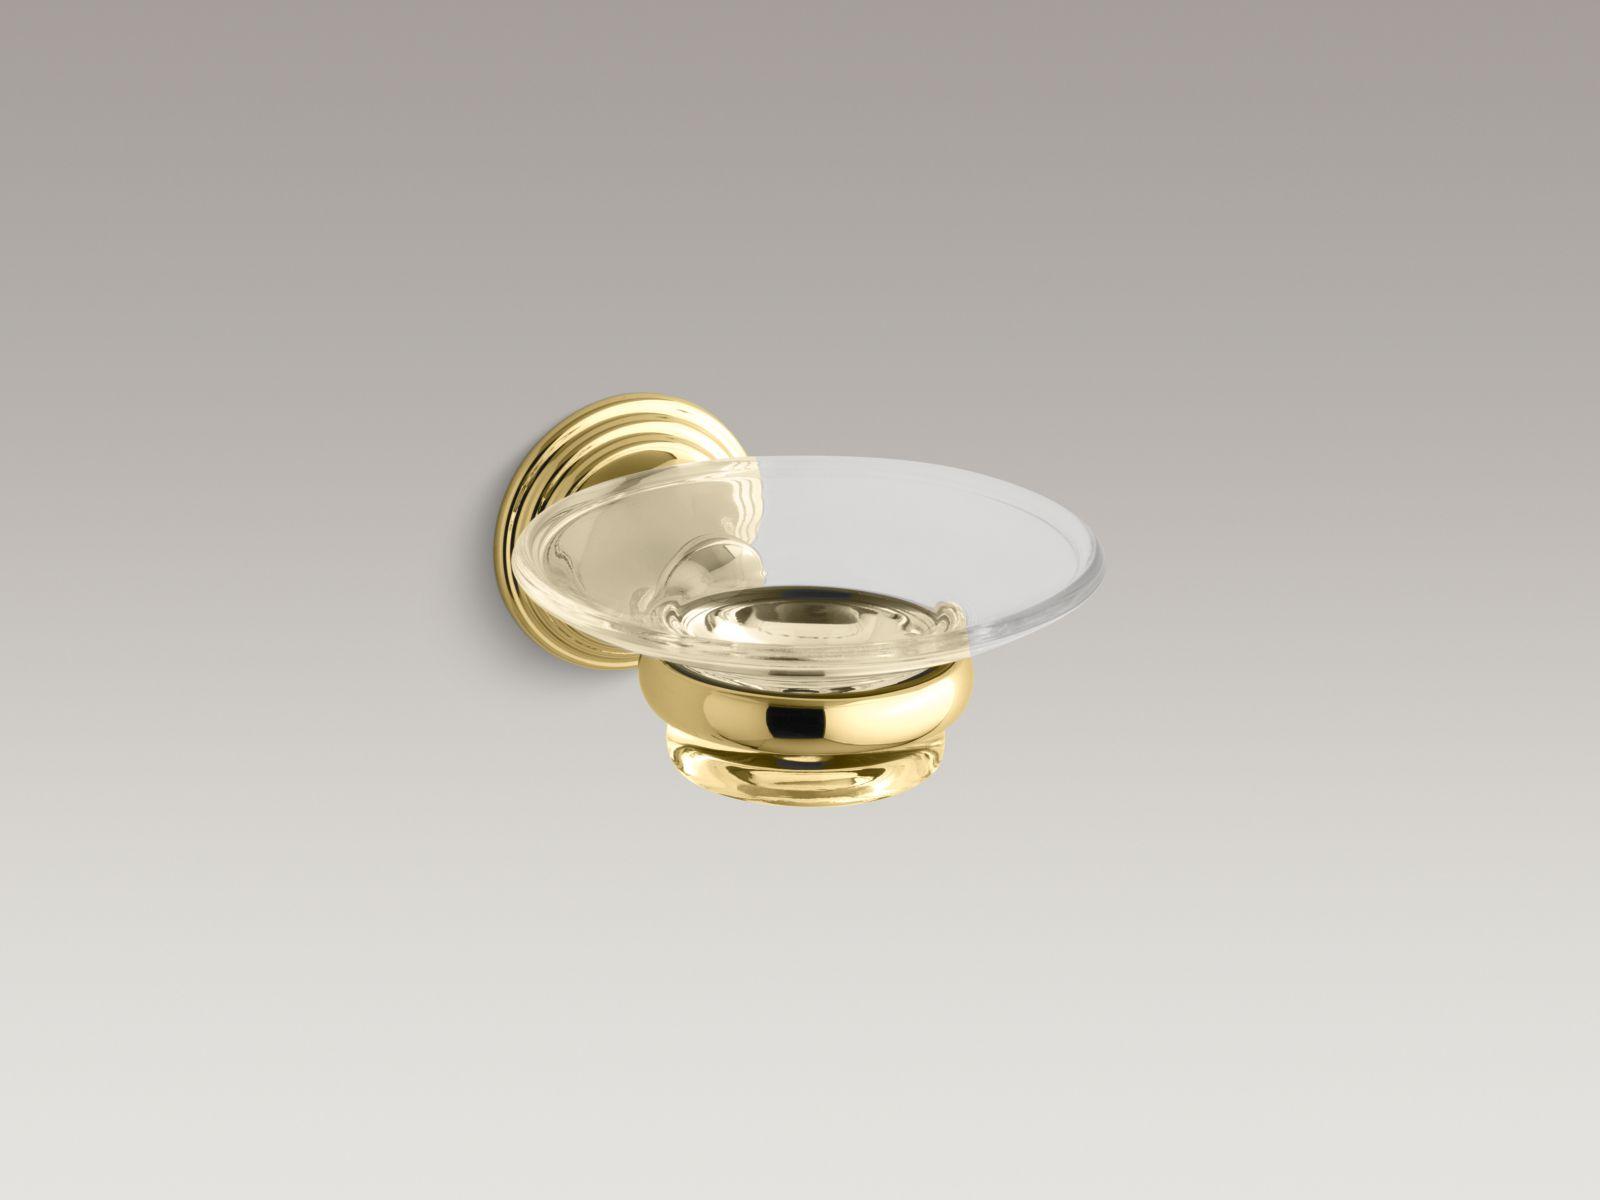 Kohler K-10560-PB Devonshire Wall-mount Soap Dish Polished Brass